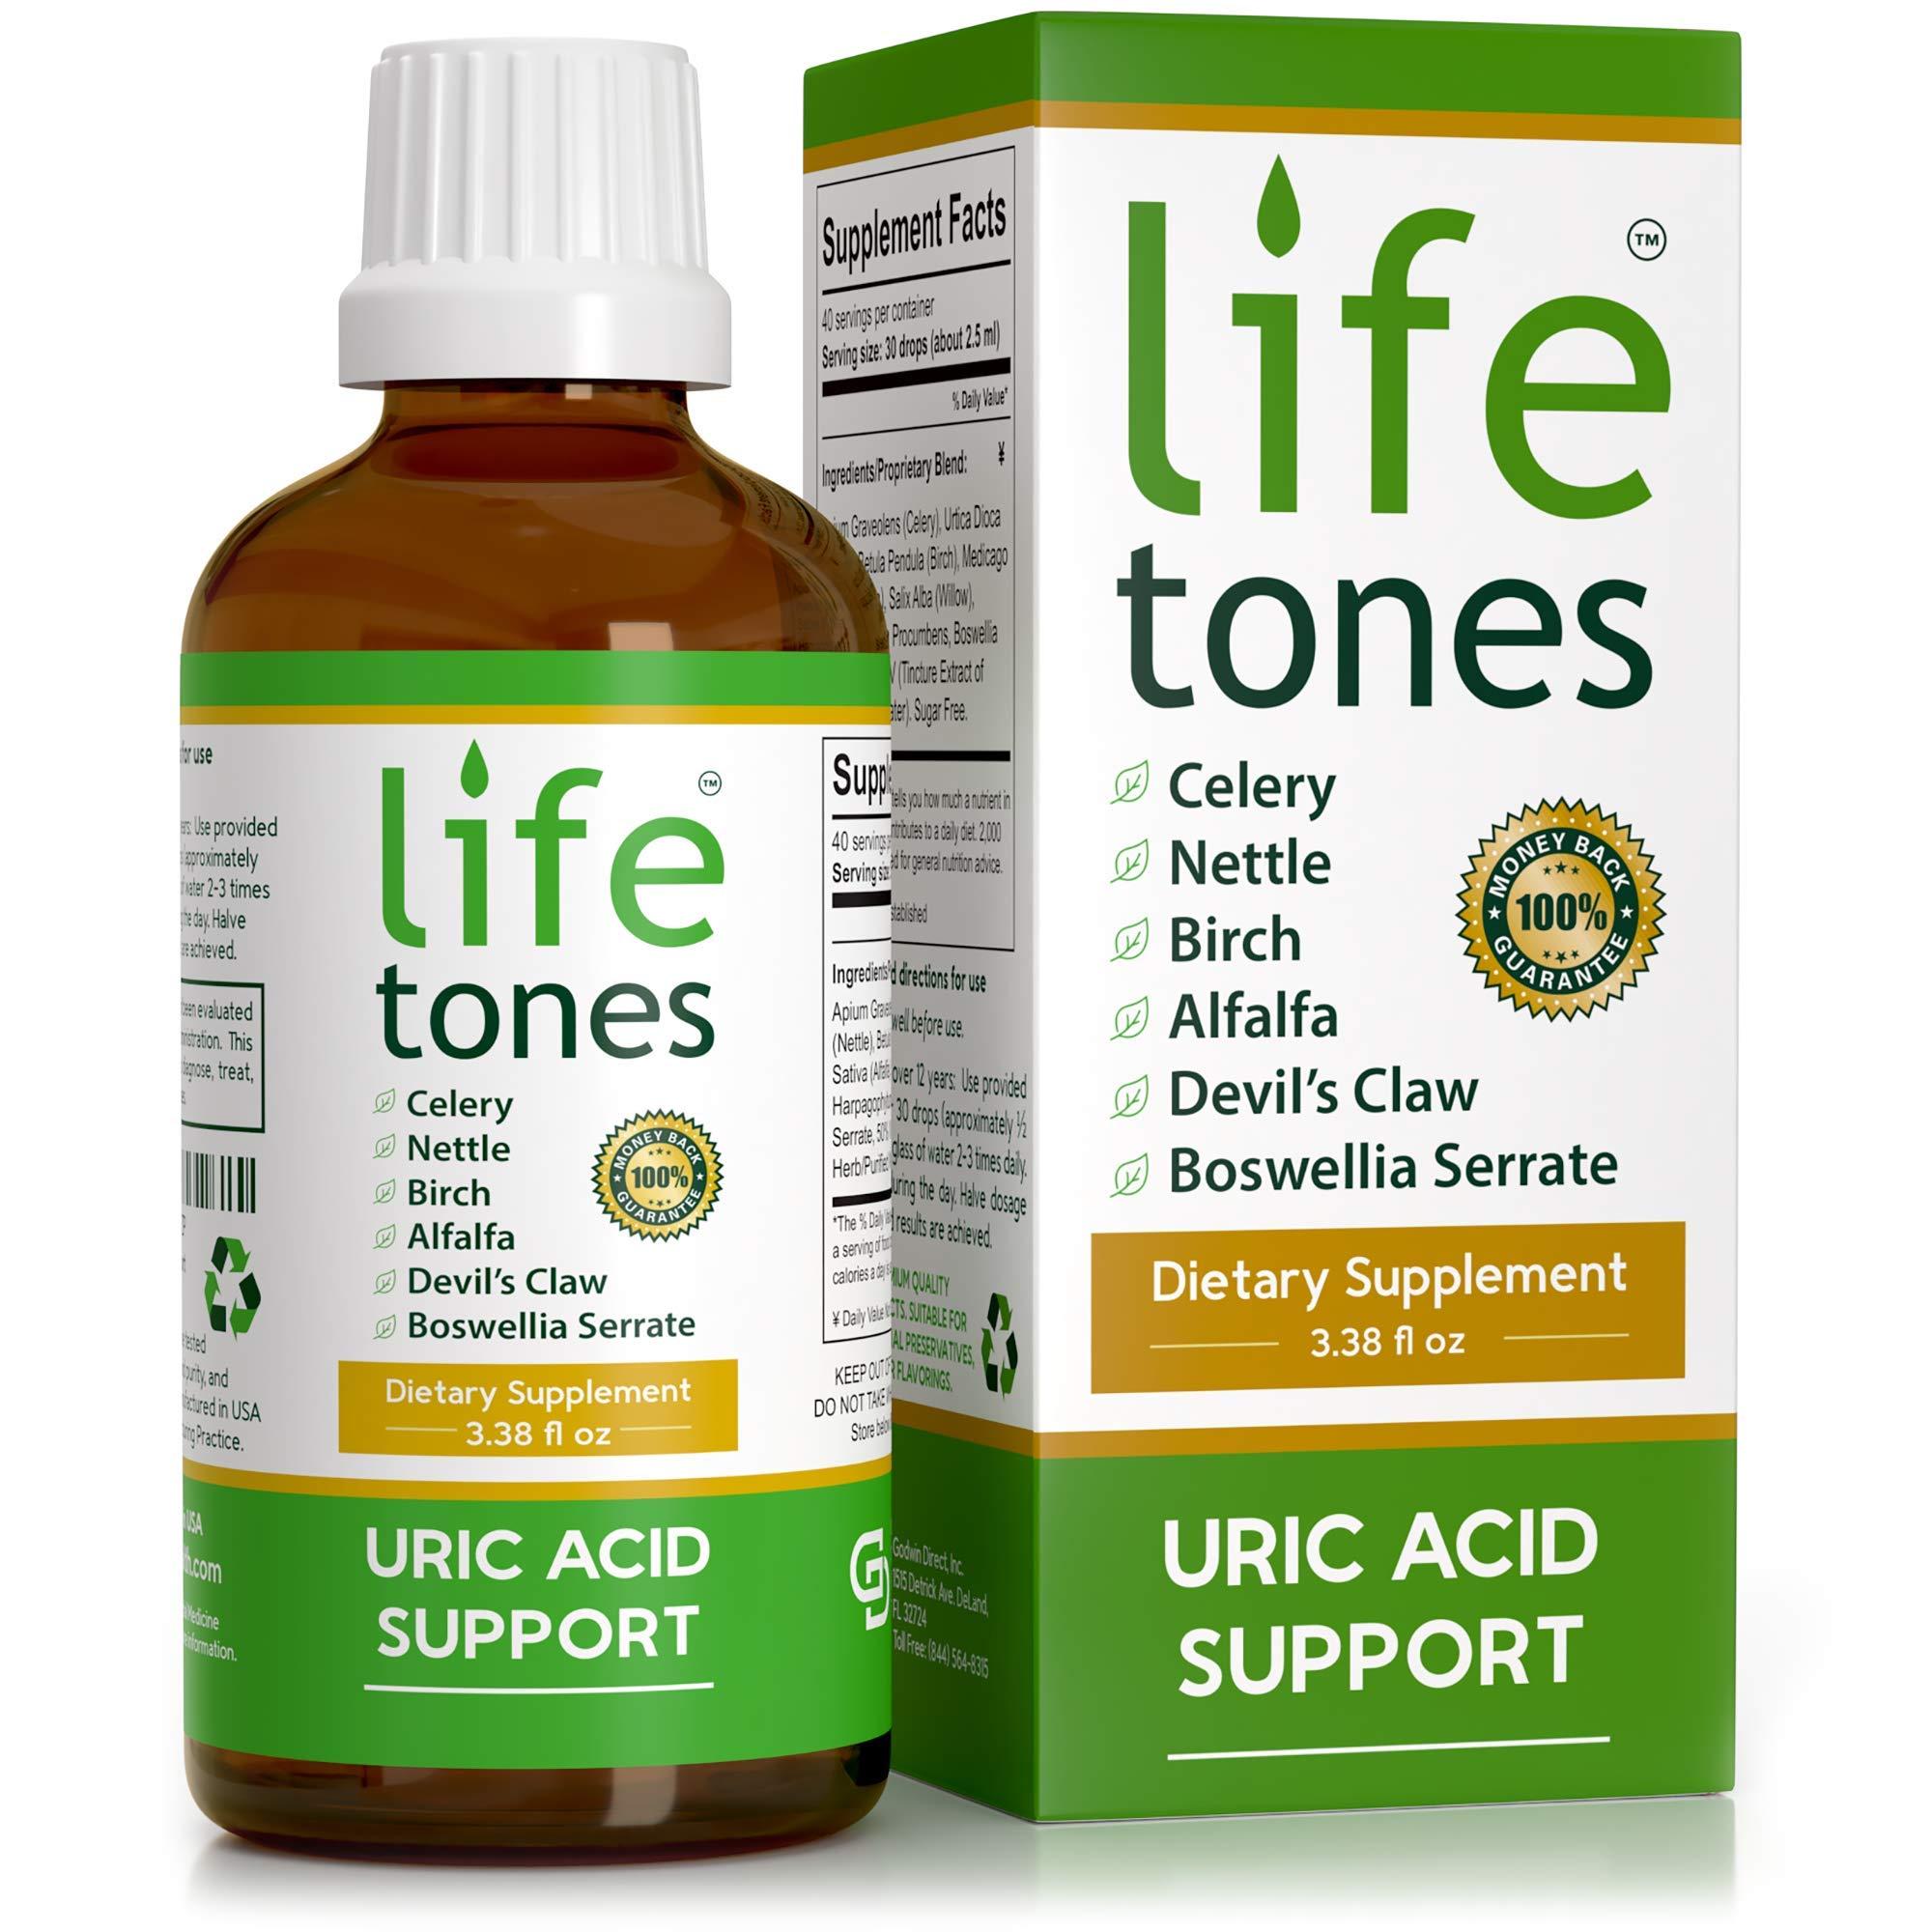 Lifetones Uric Acid Support   3.38 fl oz